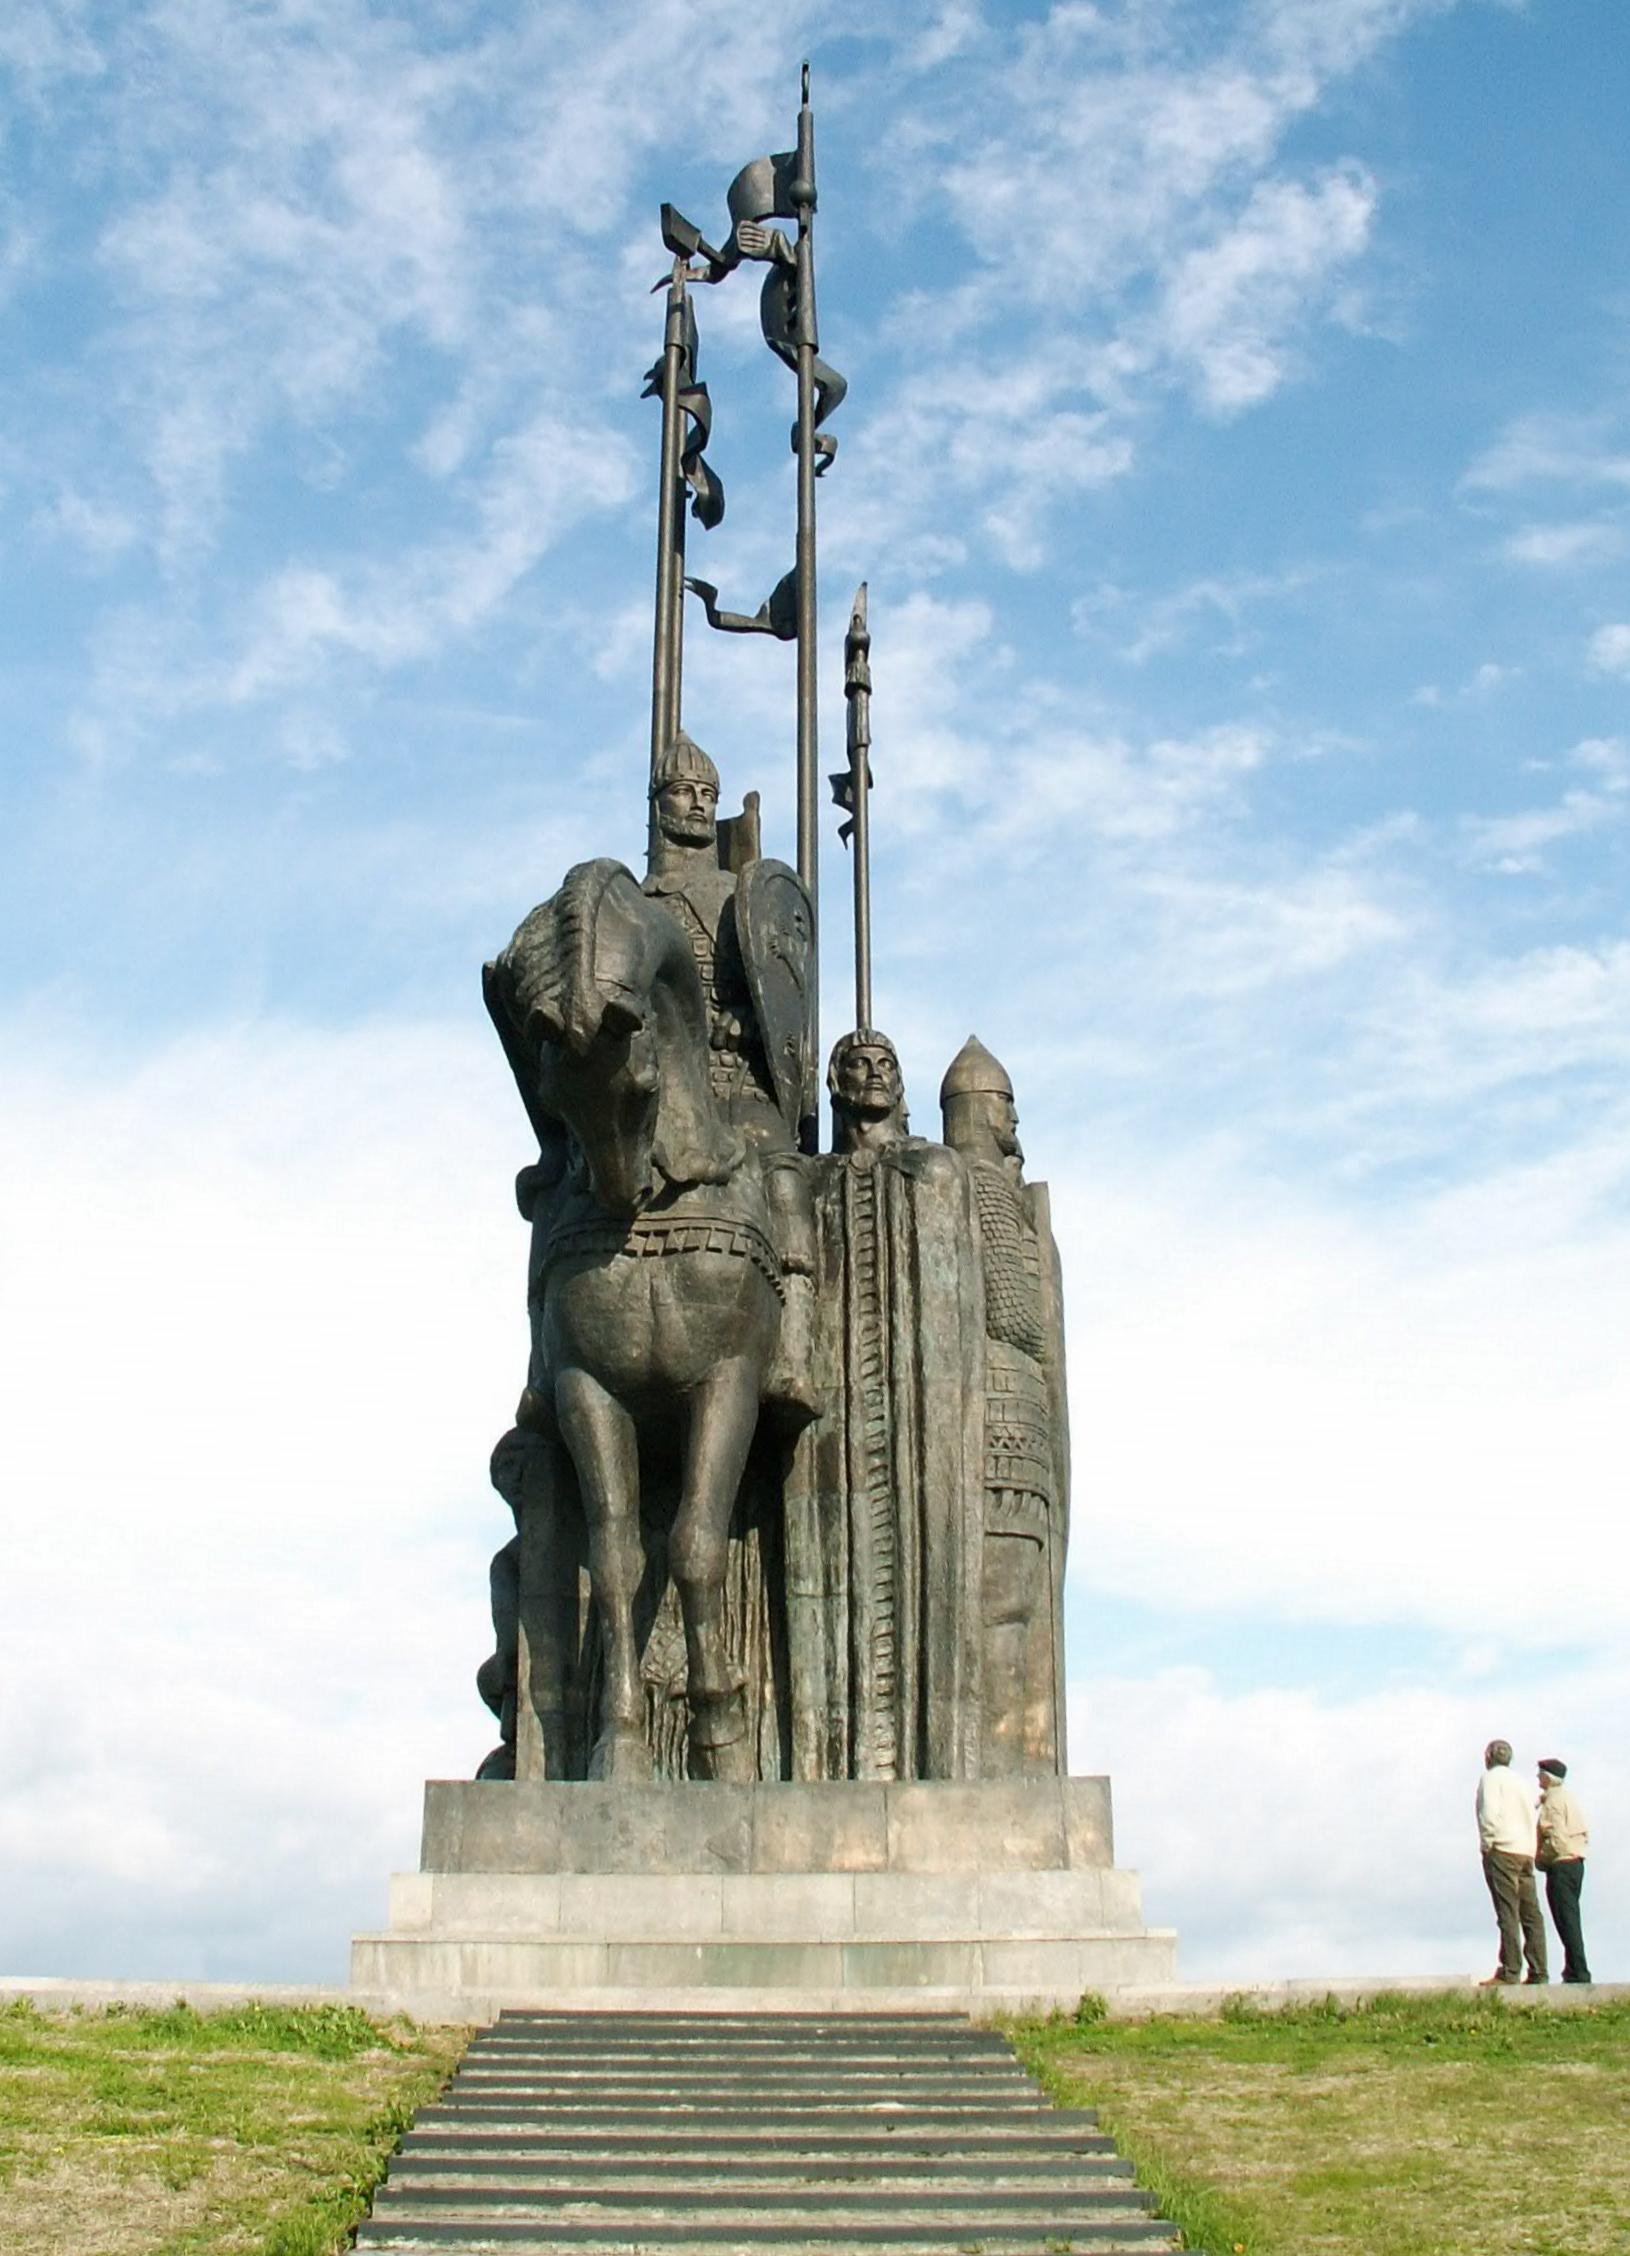 https://upload.wikimedia.org/wikipedia/ru/8/8e/Nevski_Pskov.JPG